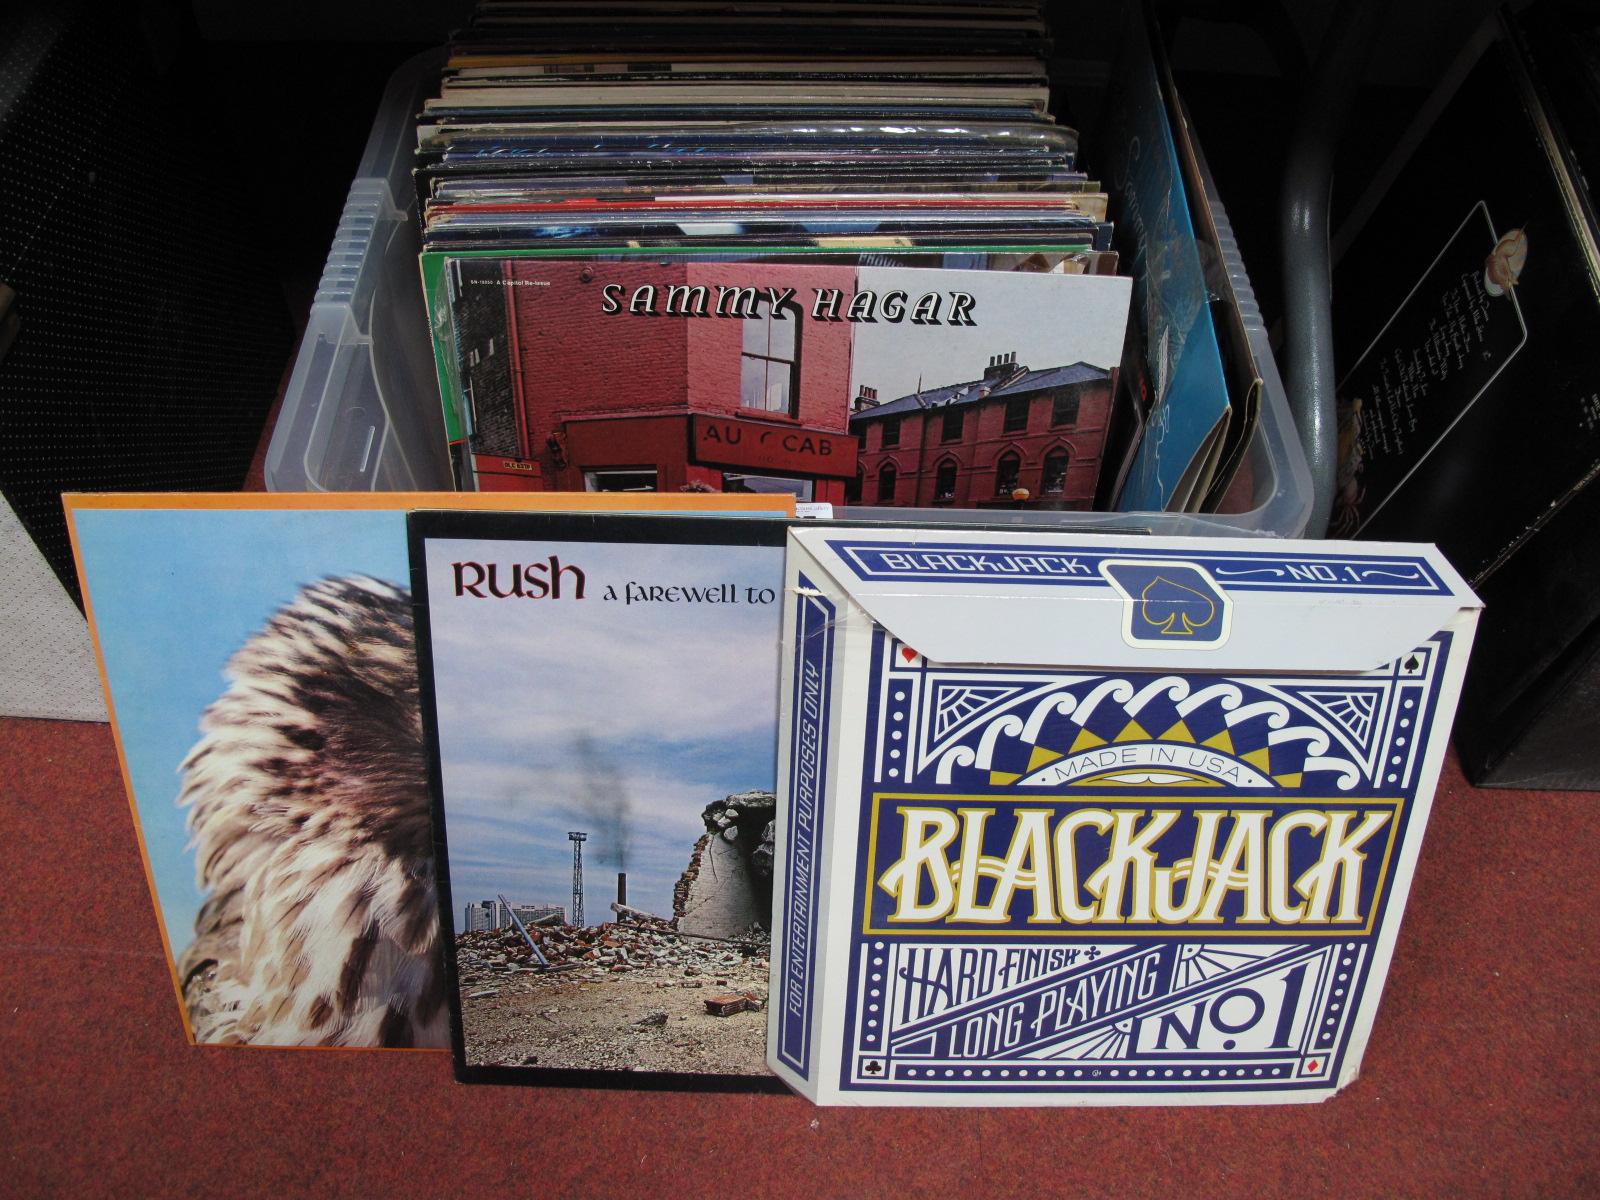 Lot 725 - Rock Interest: A Collection of LP's to include Sammy Hagar, Rush, Blackjack, Blackfoot, Rockets,